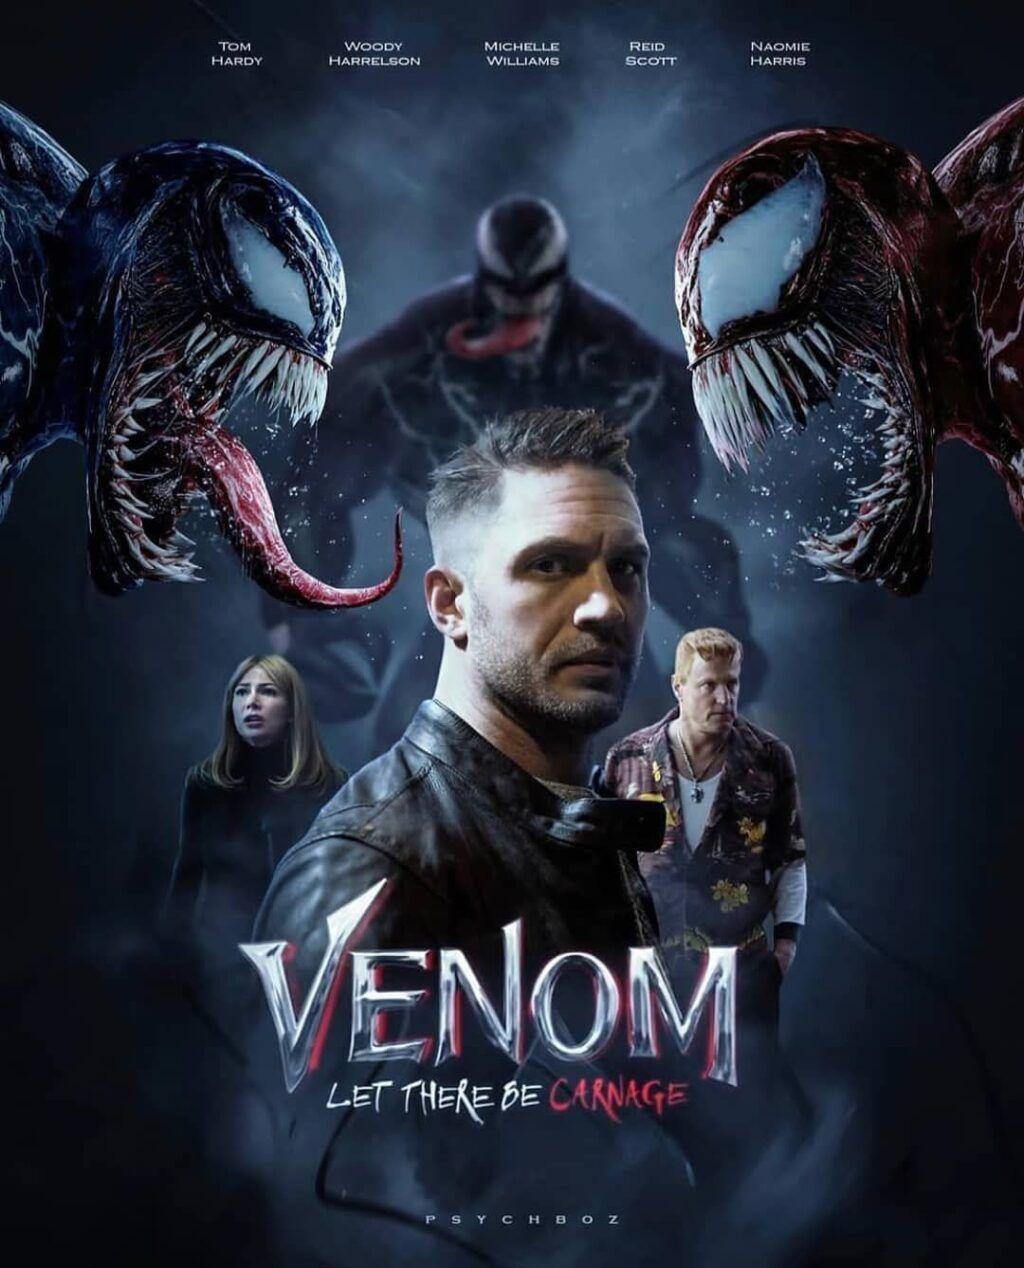 Venom Let There Be Carnage In 2021 Marvel Superhero Posters Venom Movie Marvel Heroes